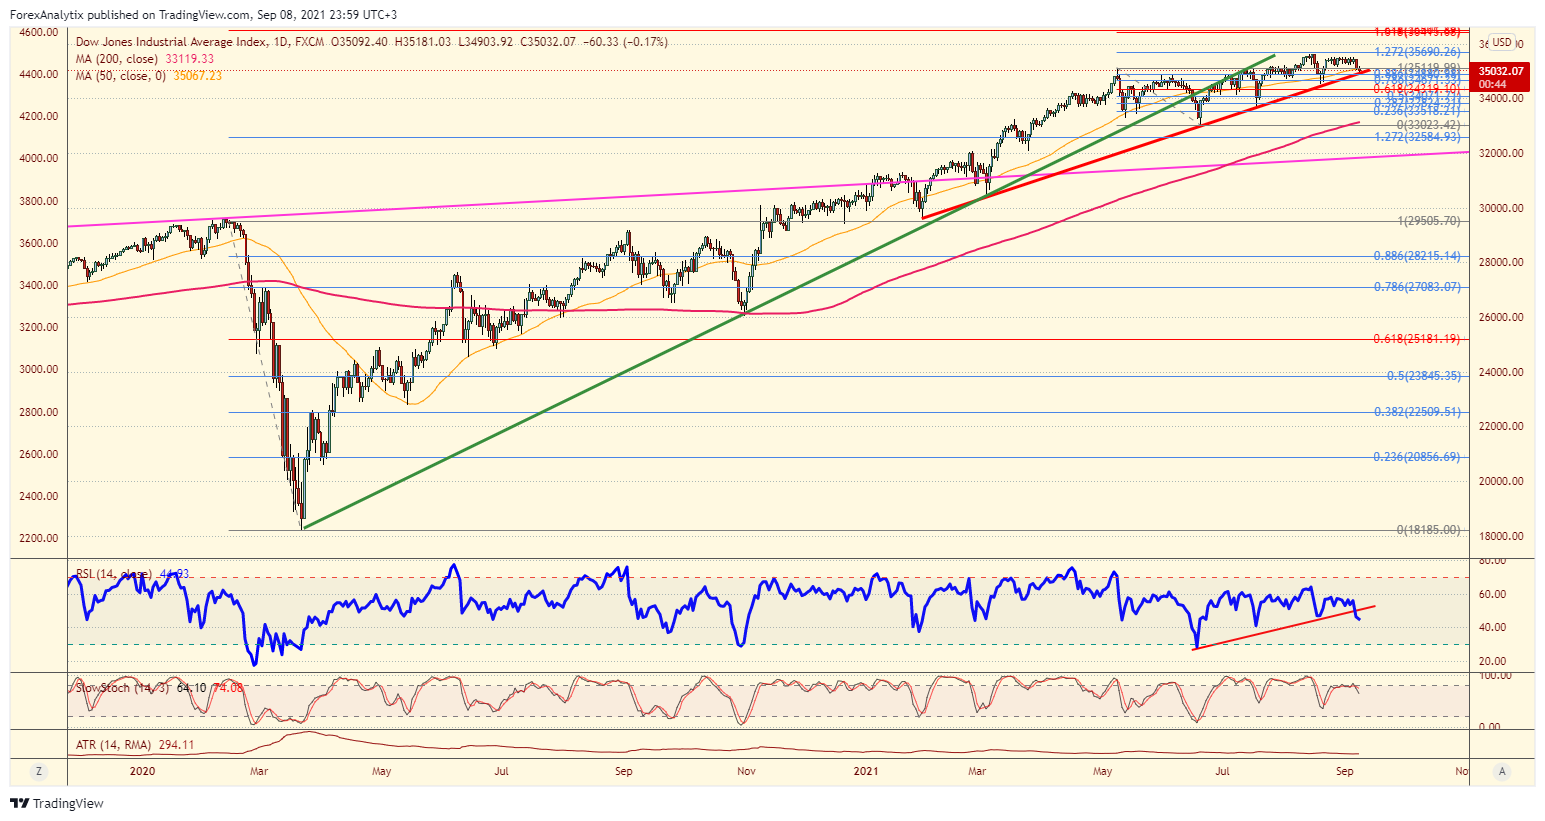 Dow Jones Industrial Average Daily Chart.